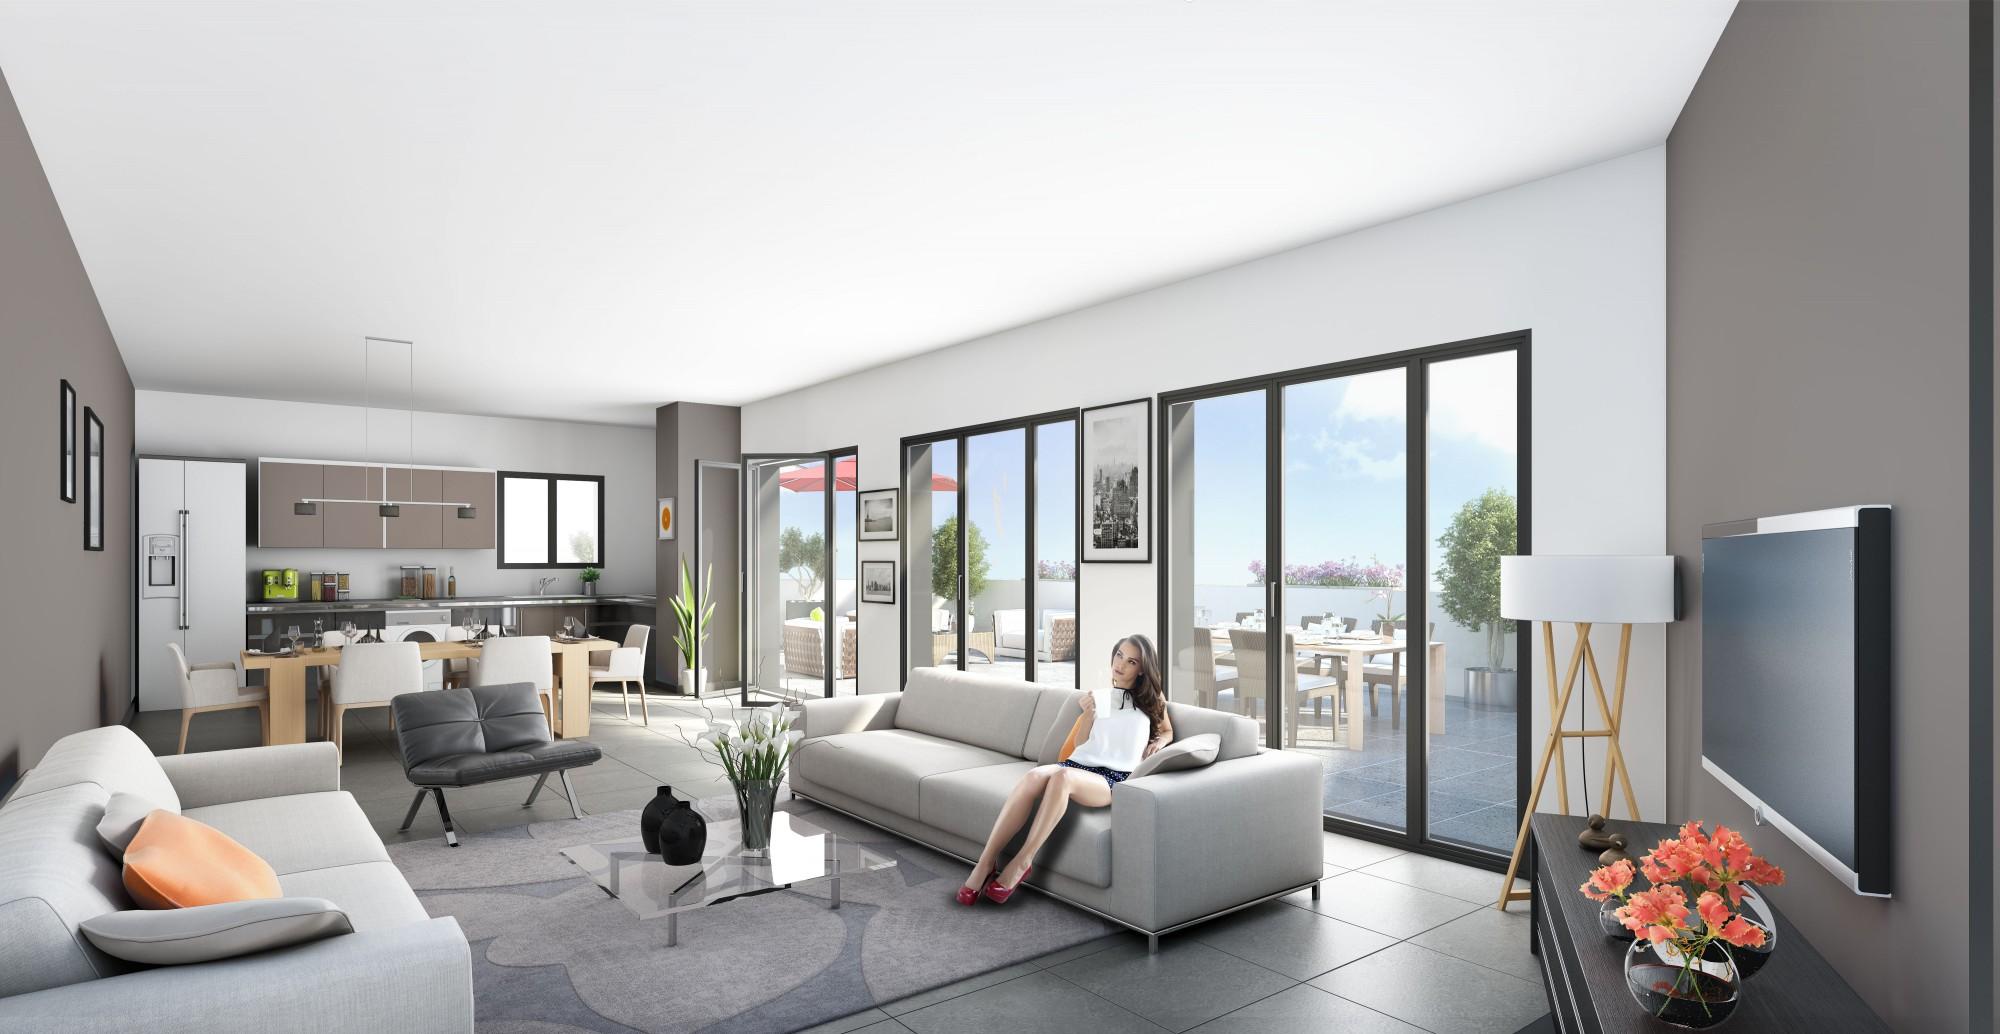 appartement t4 neuf duplex dernier tage grande terrasse lyon 5 trion saint just lots. Black Bedroom Furniture Sets. Home Design Ideas